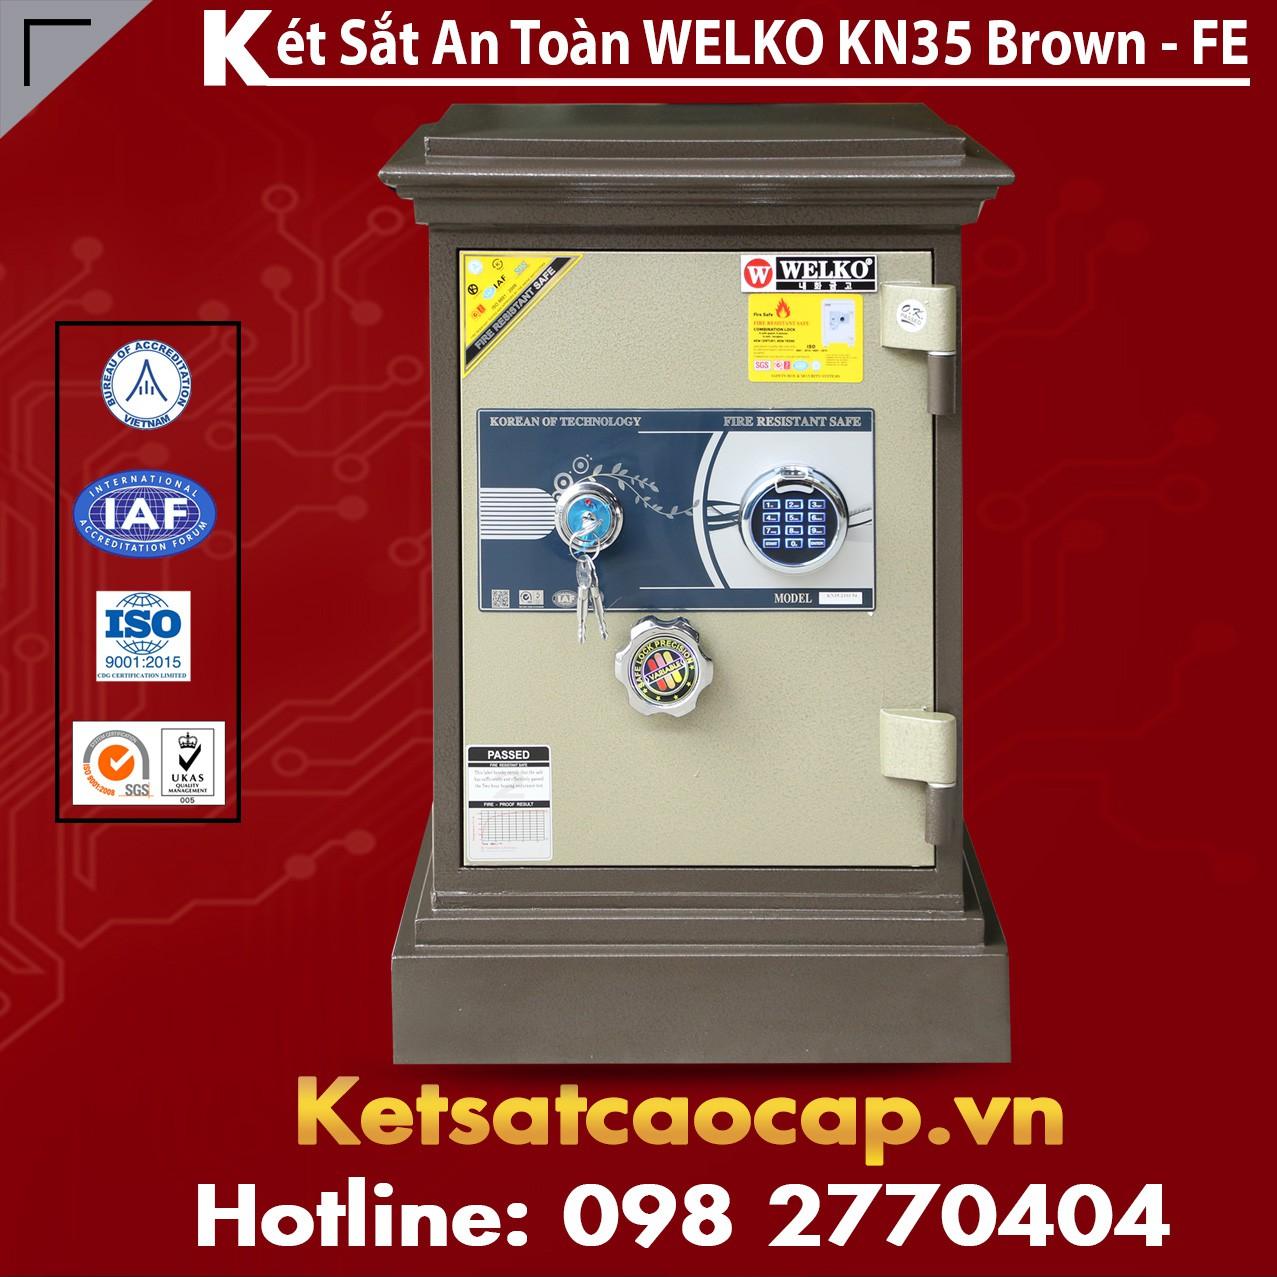 Két Sắt Khoá Vân Tay WELKO KN35 Brown - FE